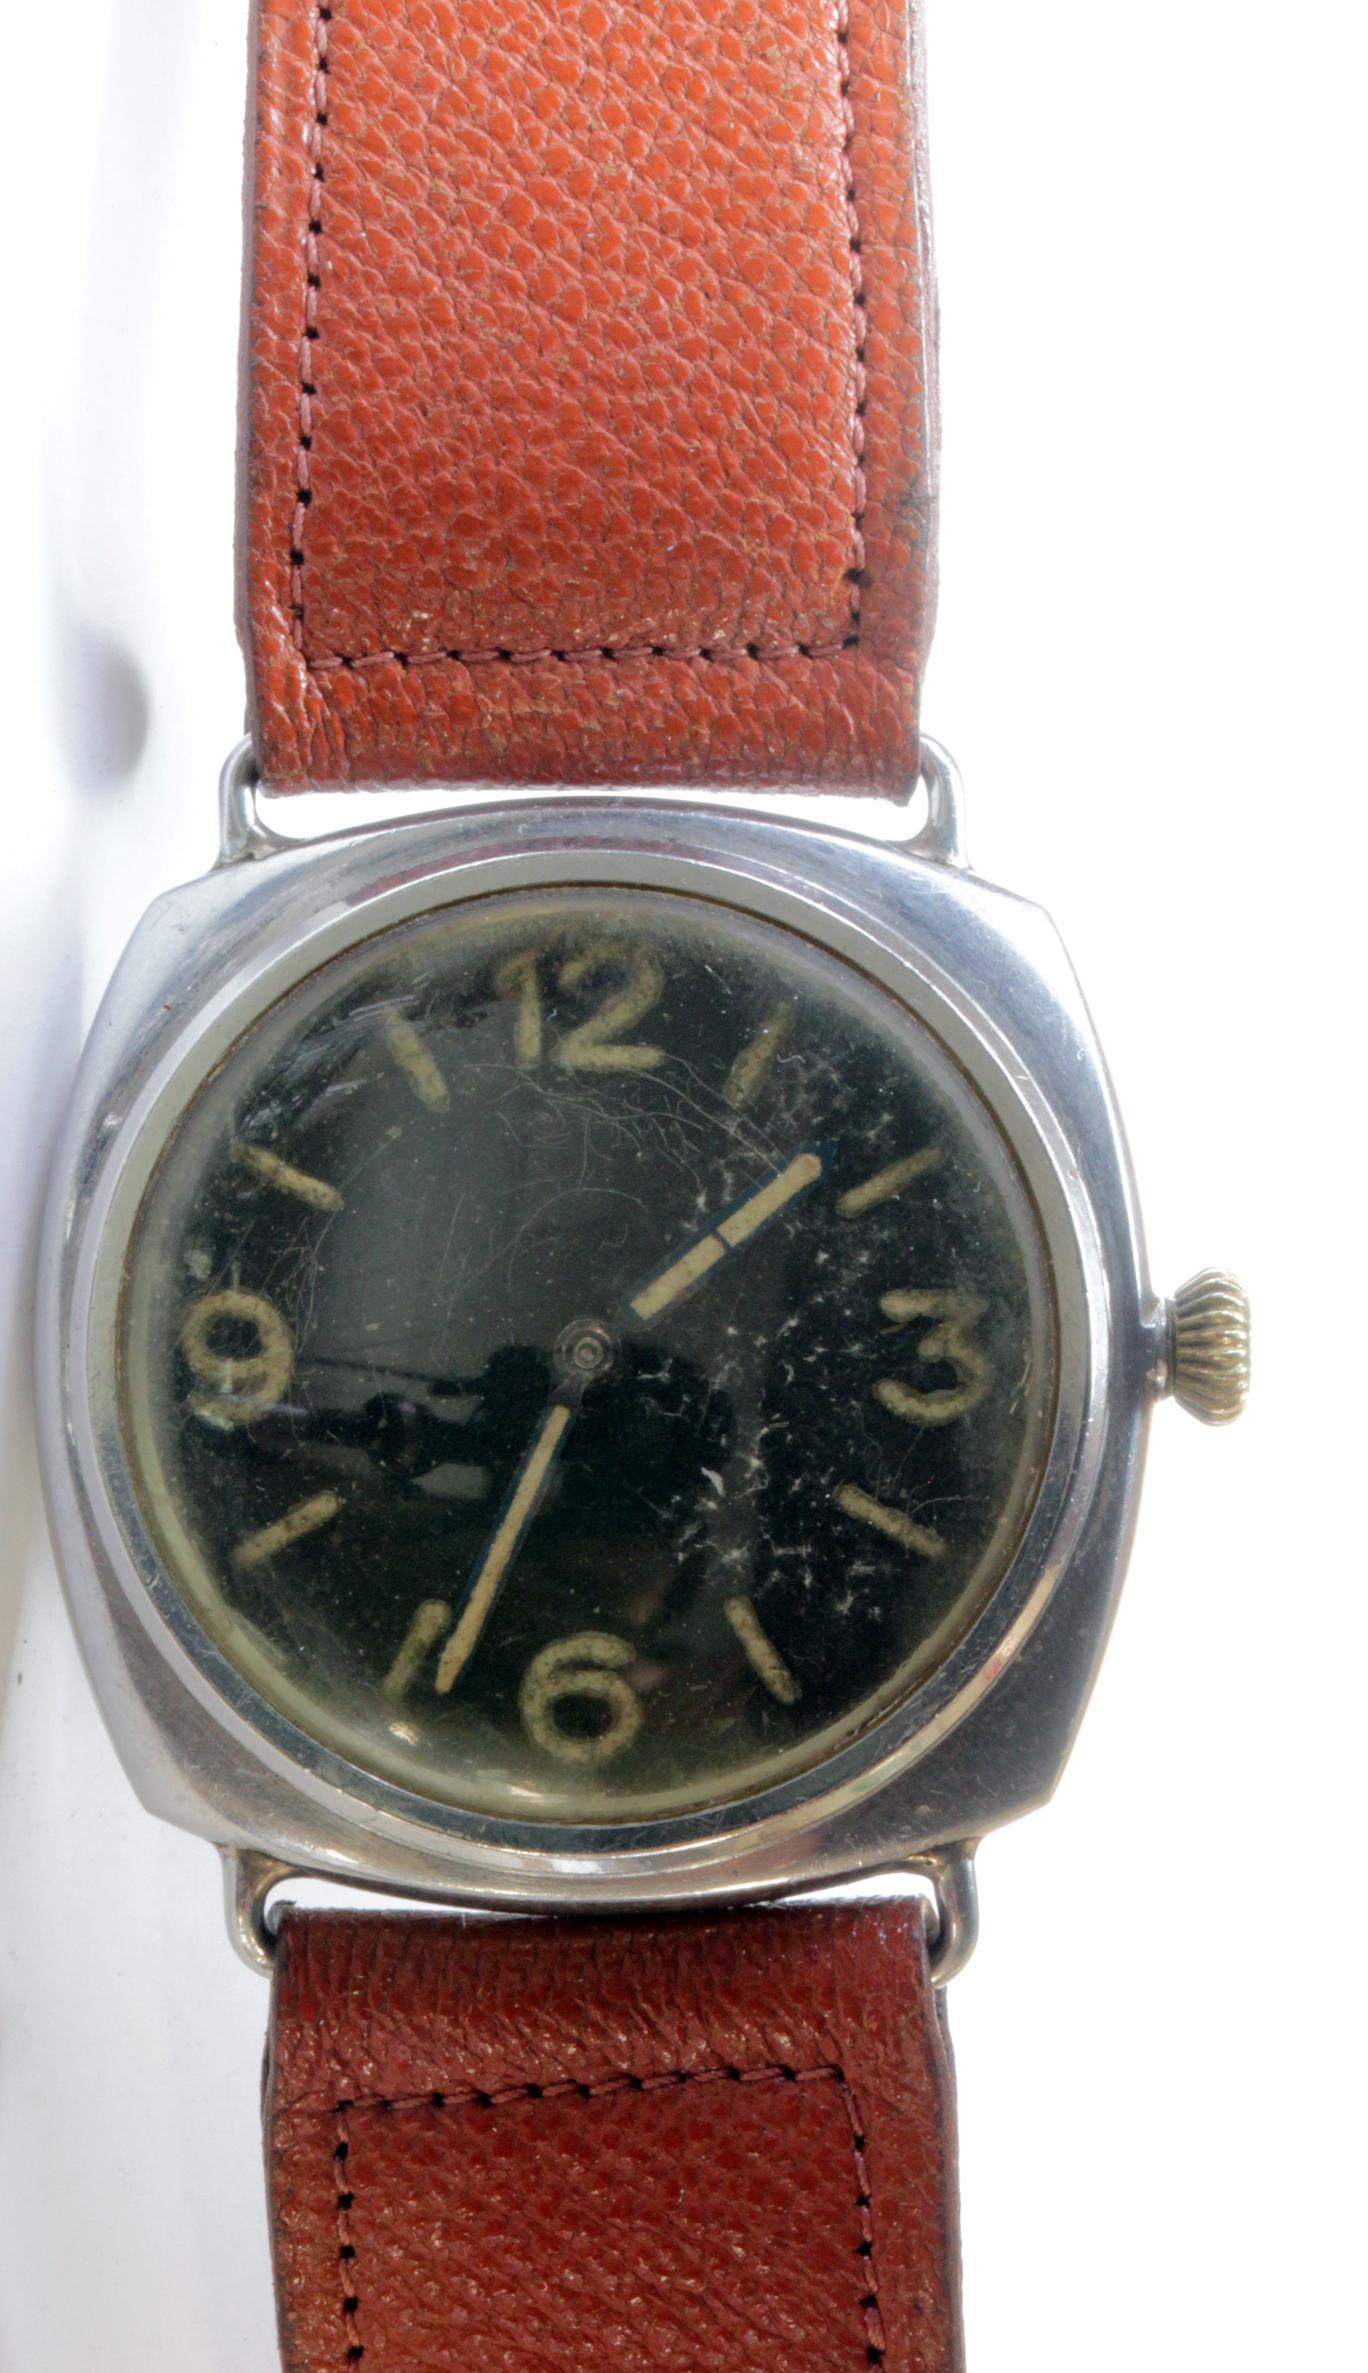 Lot 307 - WWII German Panerai Frogmens military wristwatch (Model 3646), with Rolex 17 Rubis movement, black